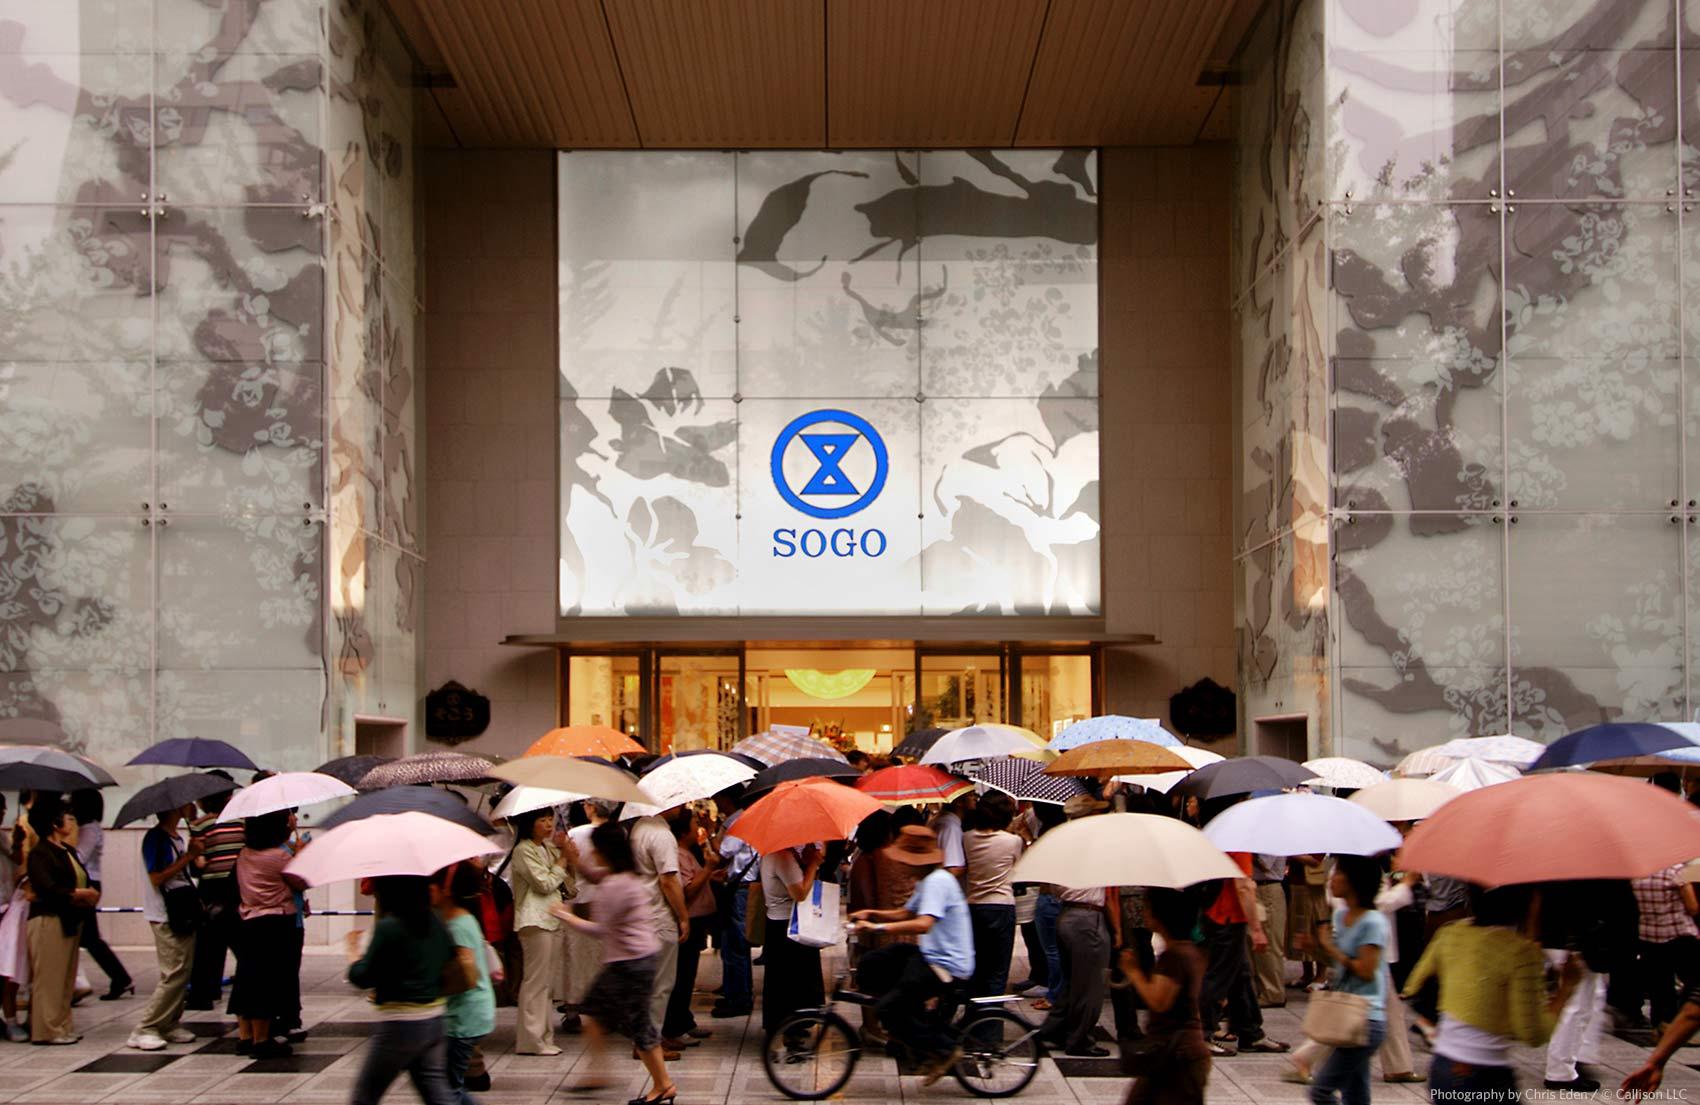 SOGO - Osaka, Japan - Exterior entrance detail